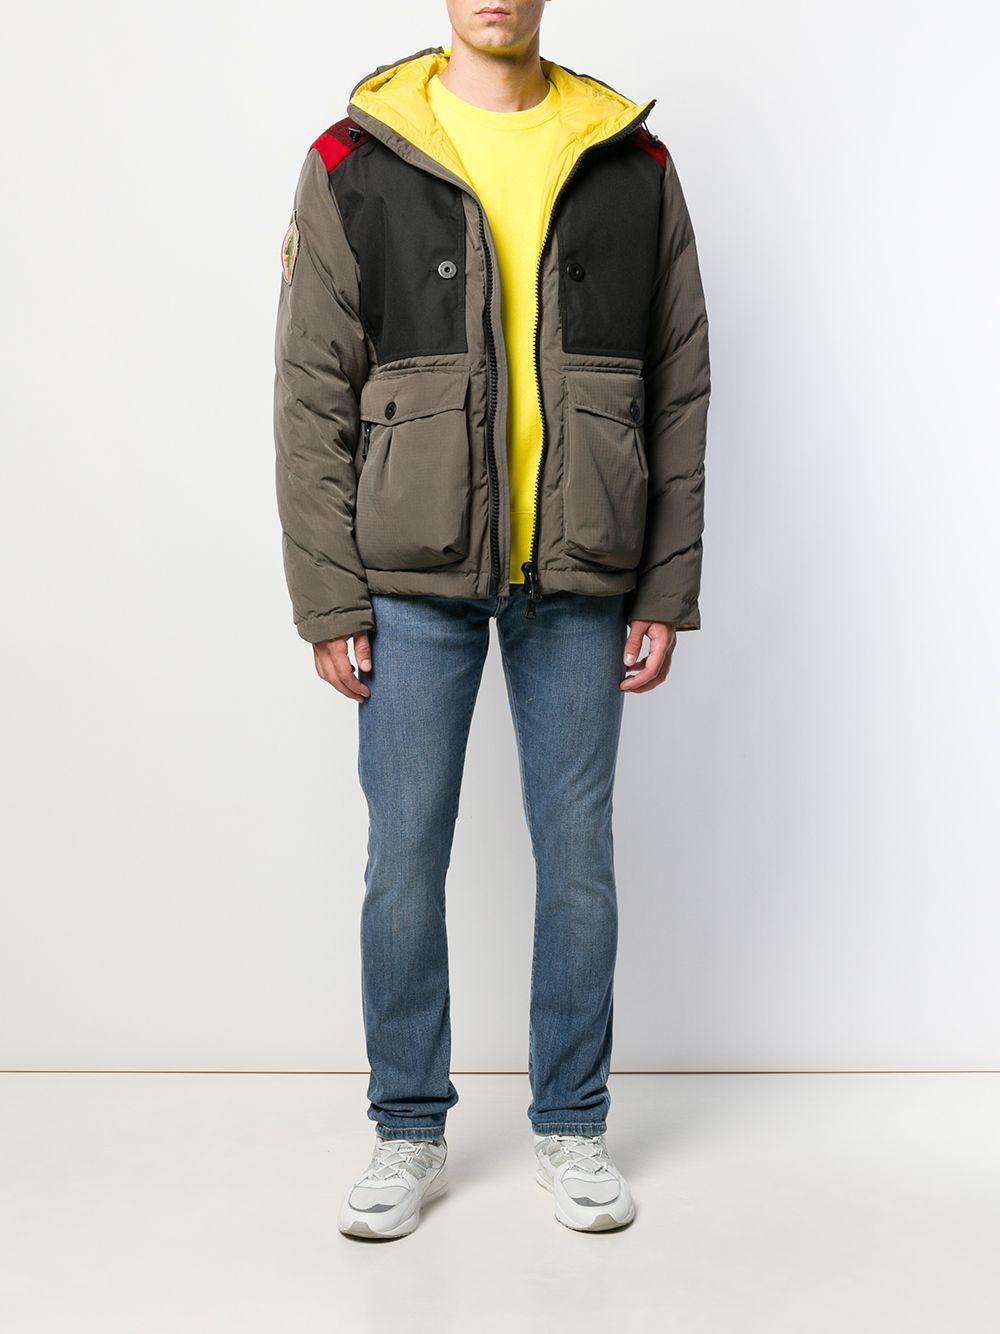 jeans rebel uomo denim CARHARTT WIP   Jeans   I01533101.WH